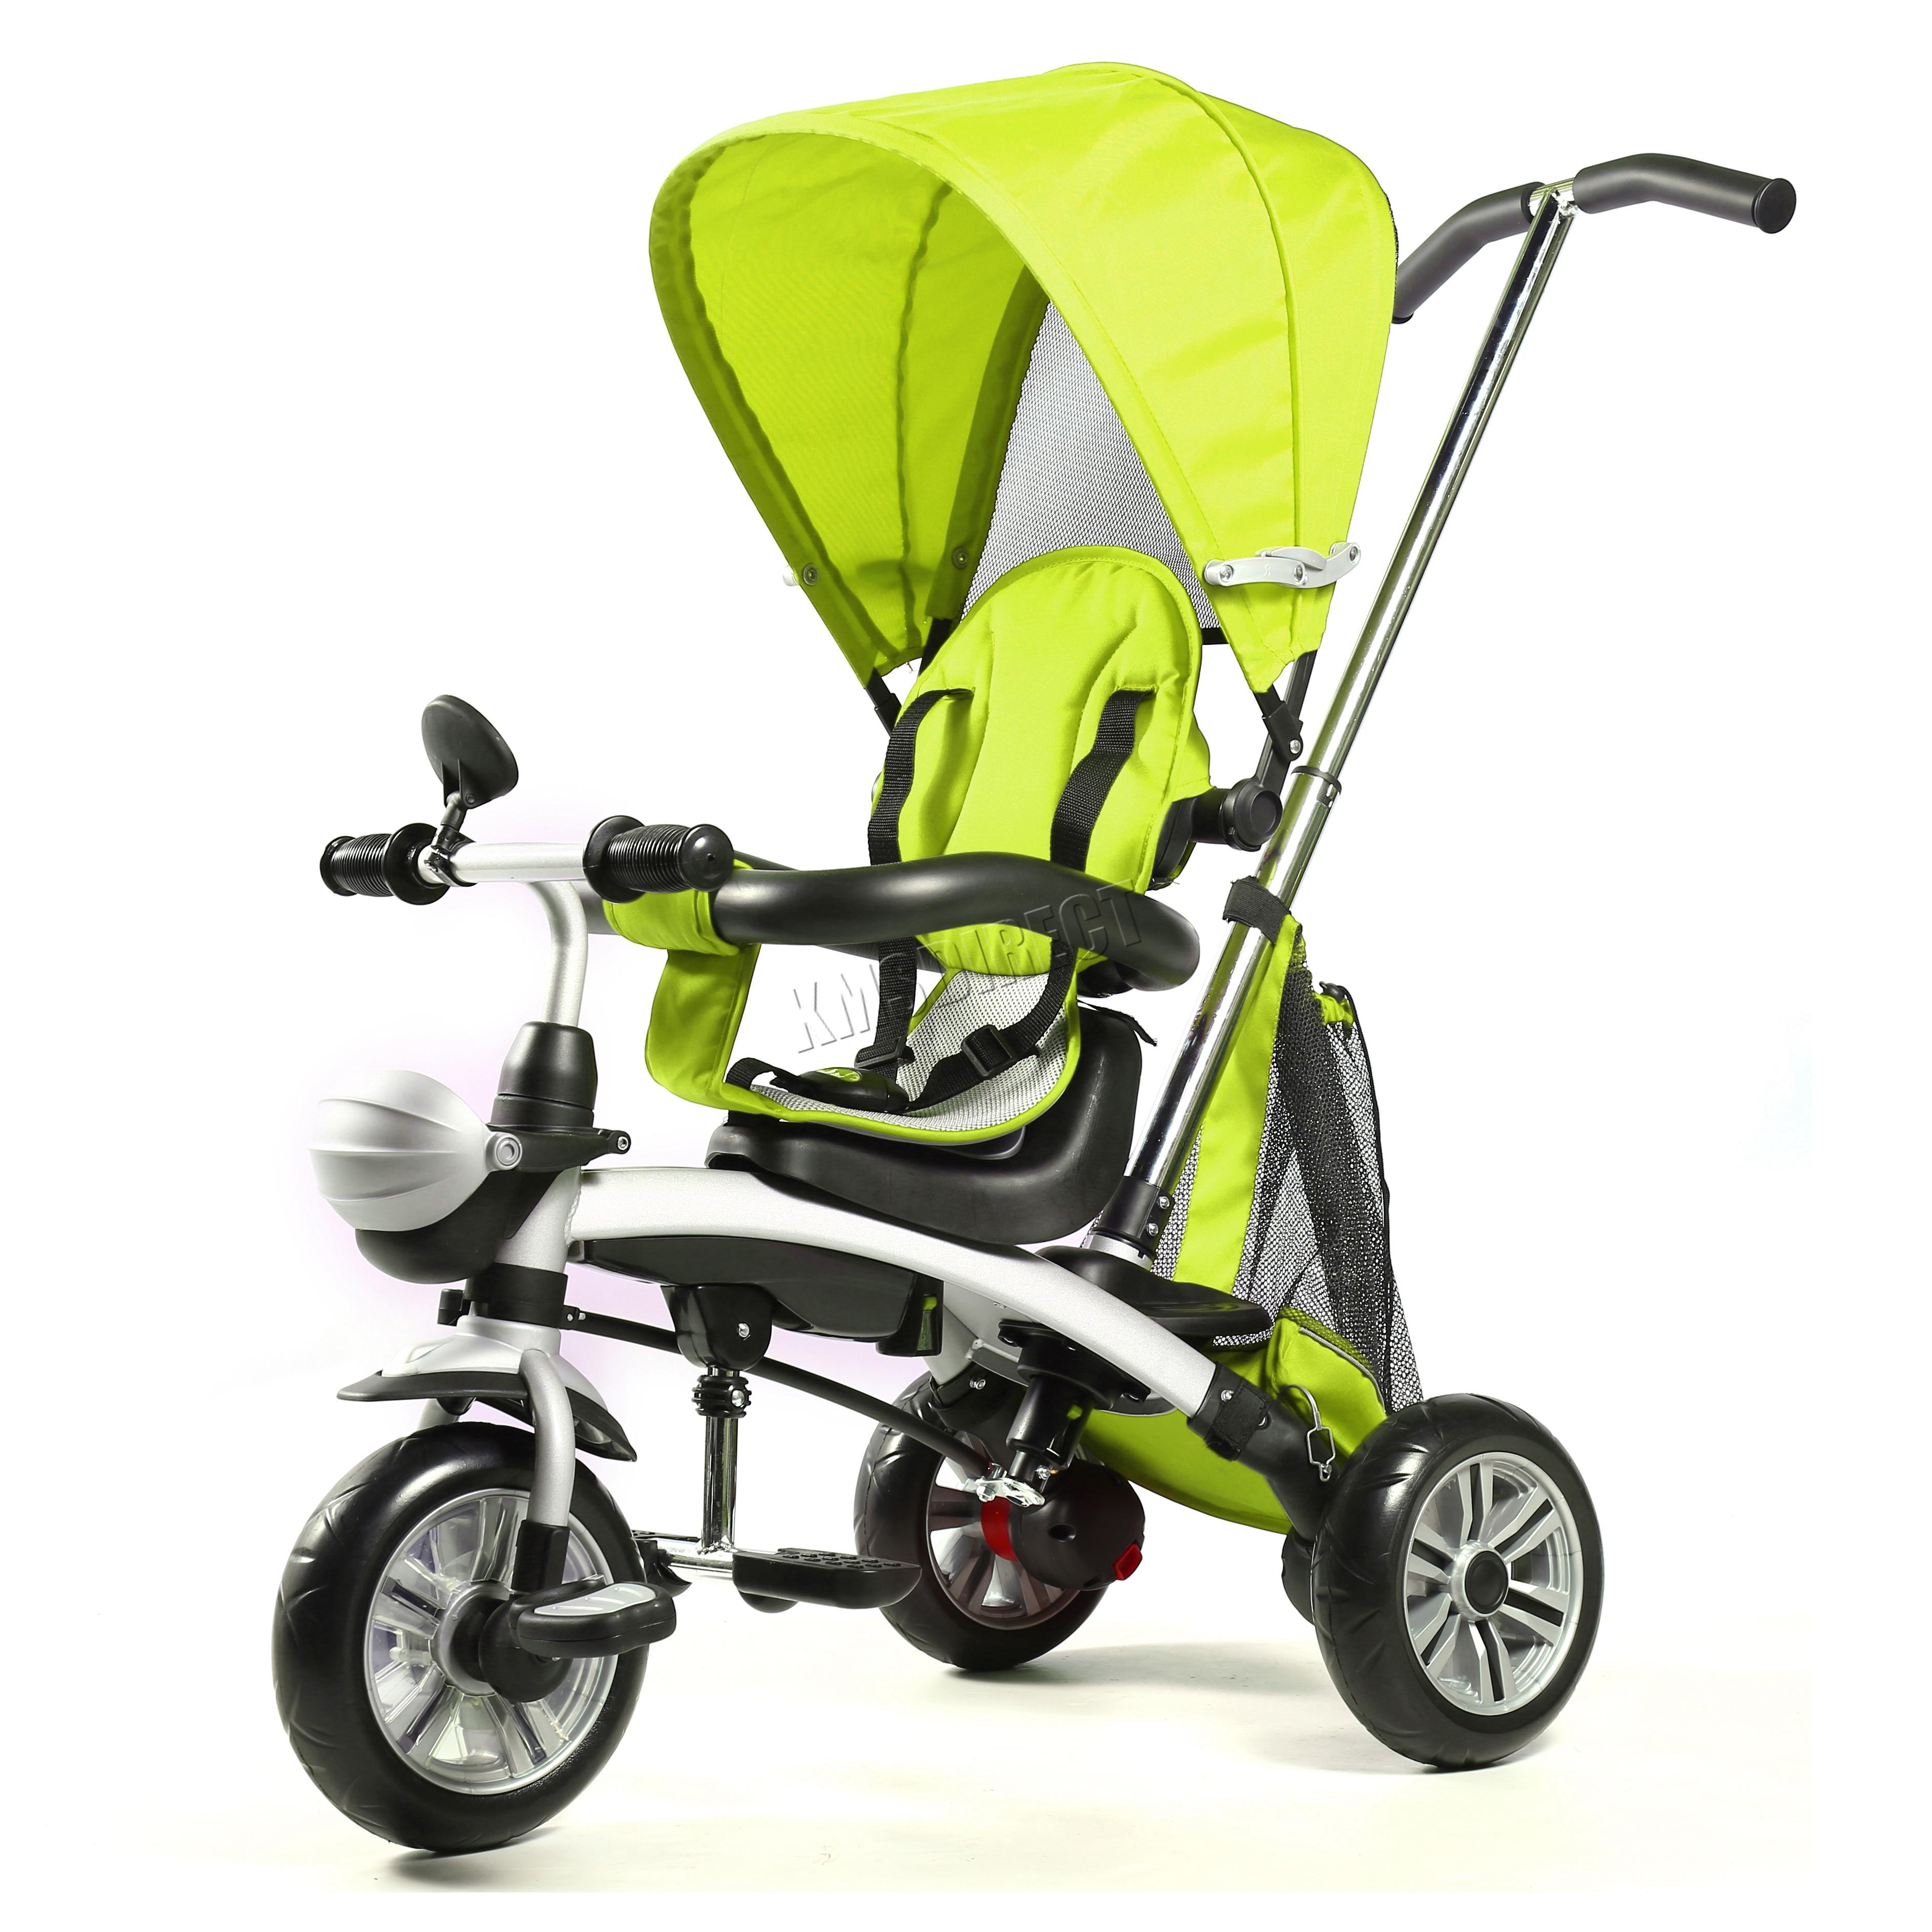 FoxHunter 4 in 1 Kids Tricycle 3 Wheels Children Ride On Trike ...